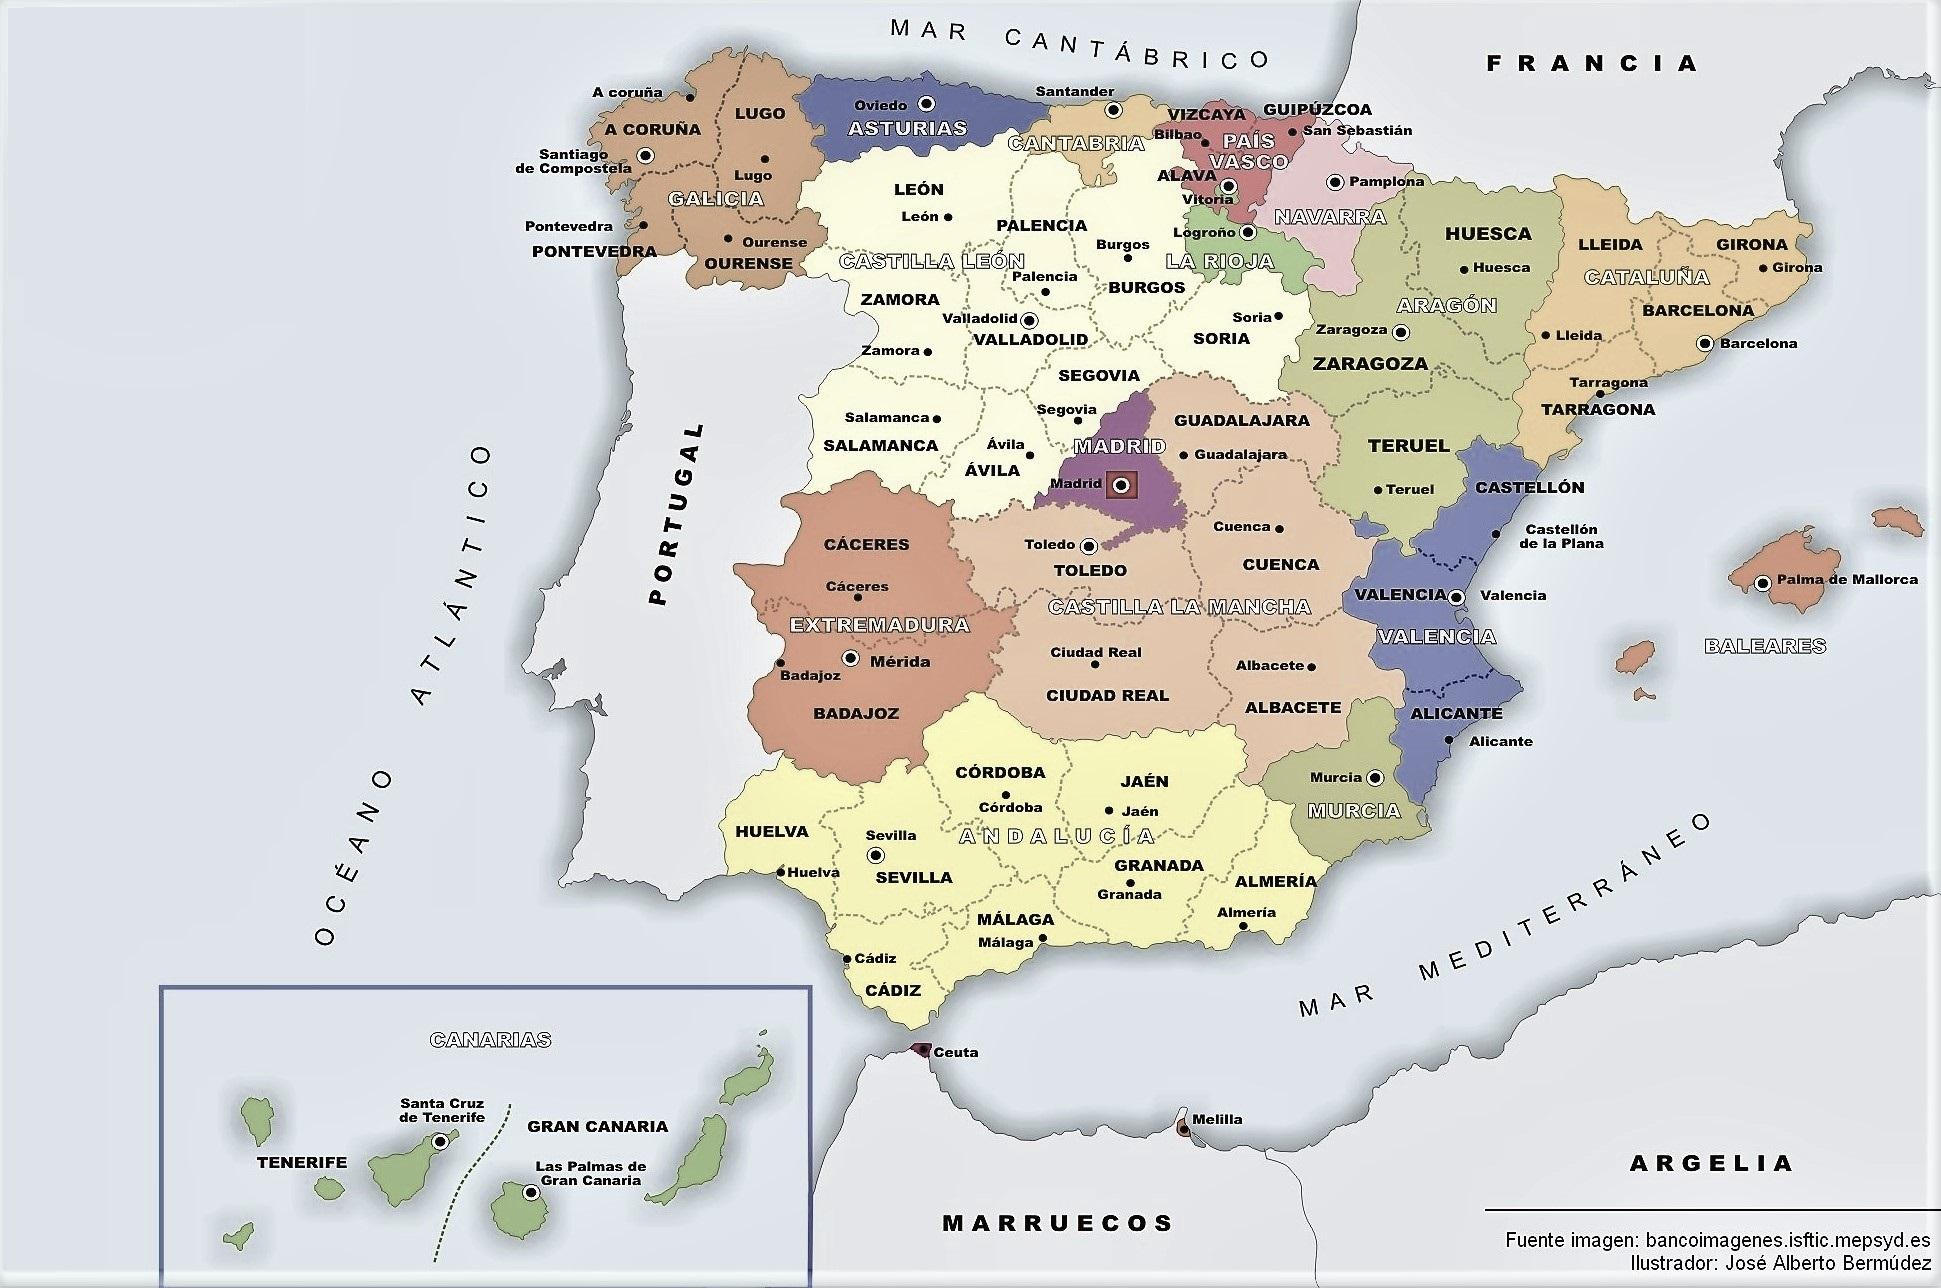 Mapa Mudo Politico De España Para Imprimir Tamaño Folio.Mapa De Espana Politico Fisico Mudo Para